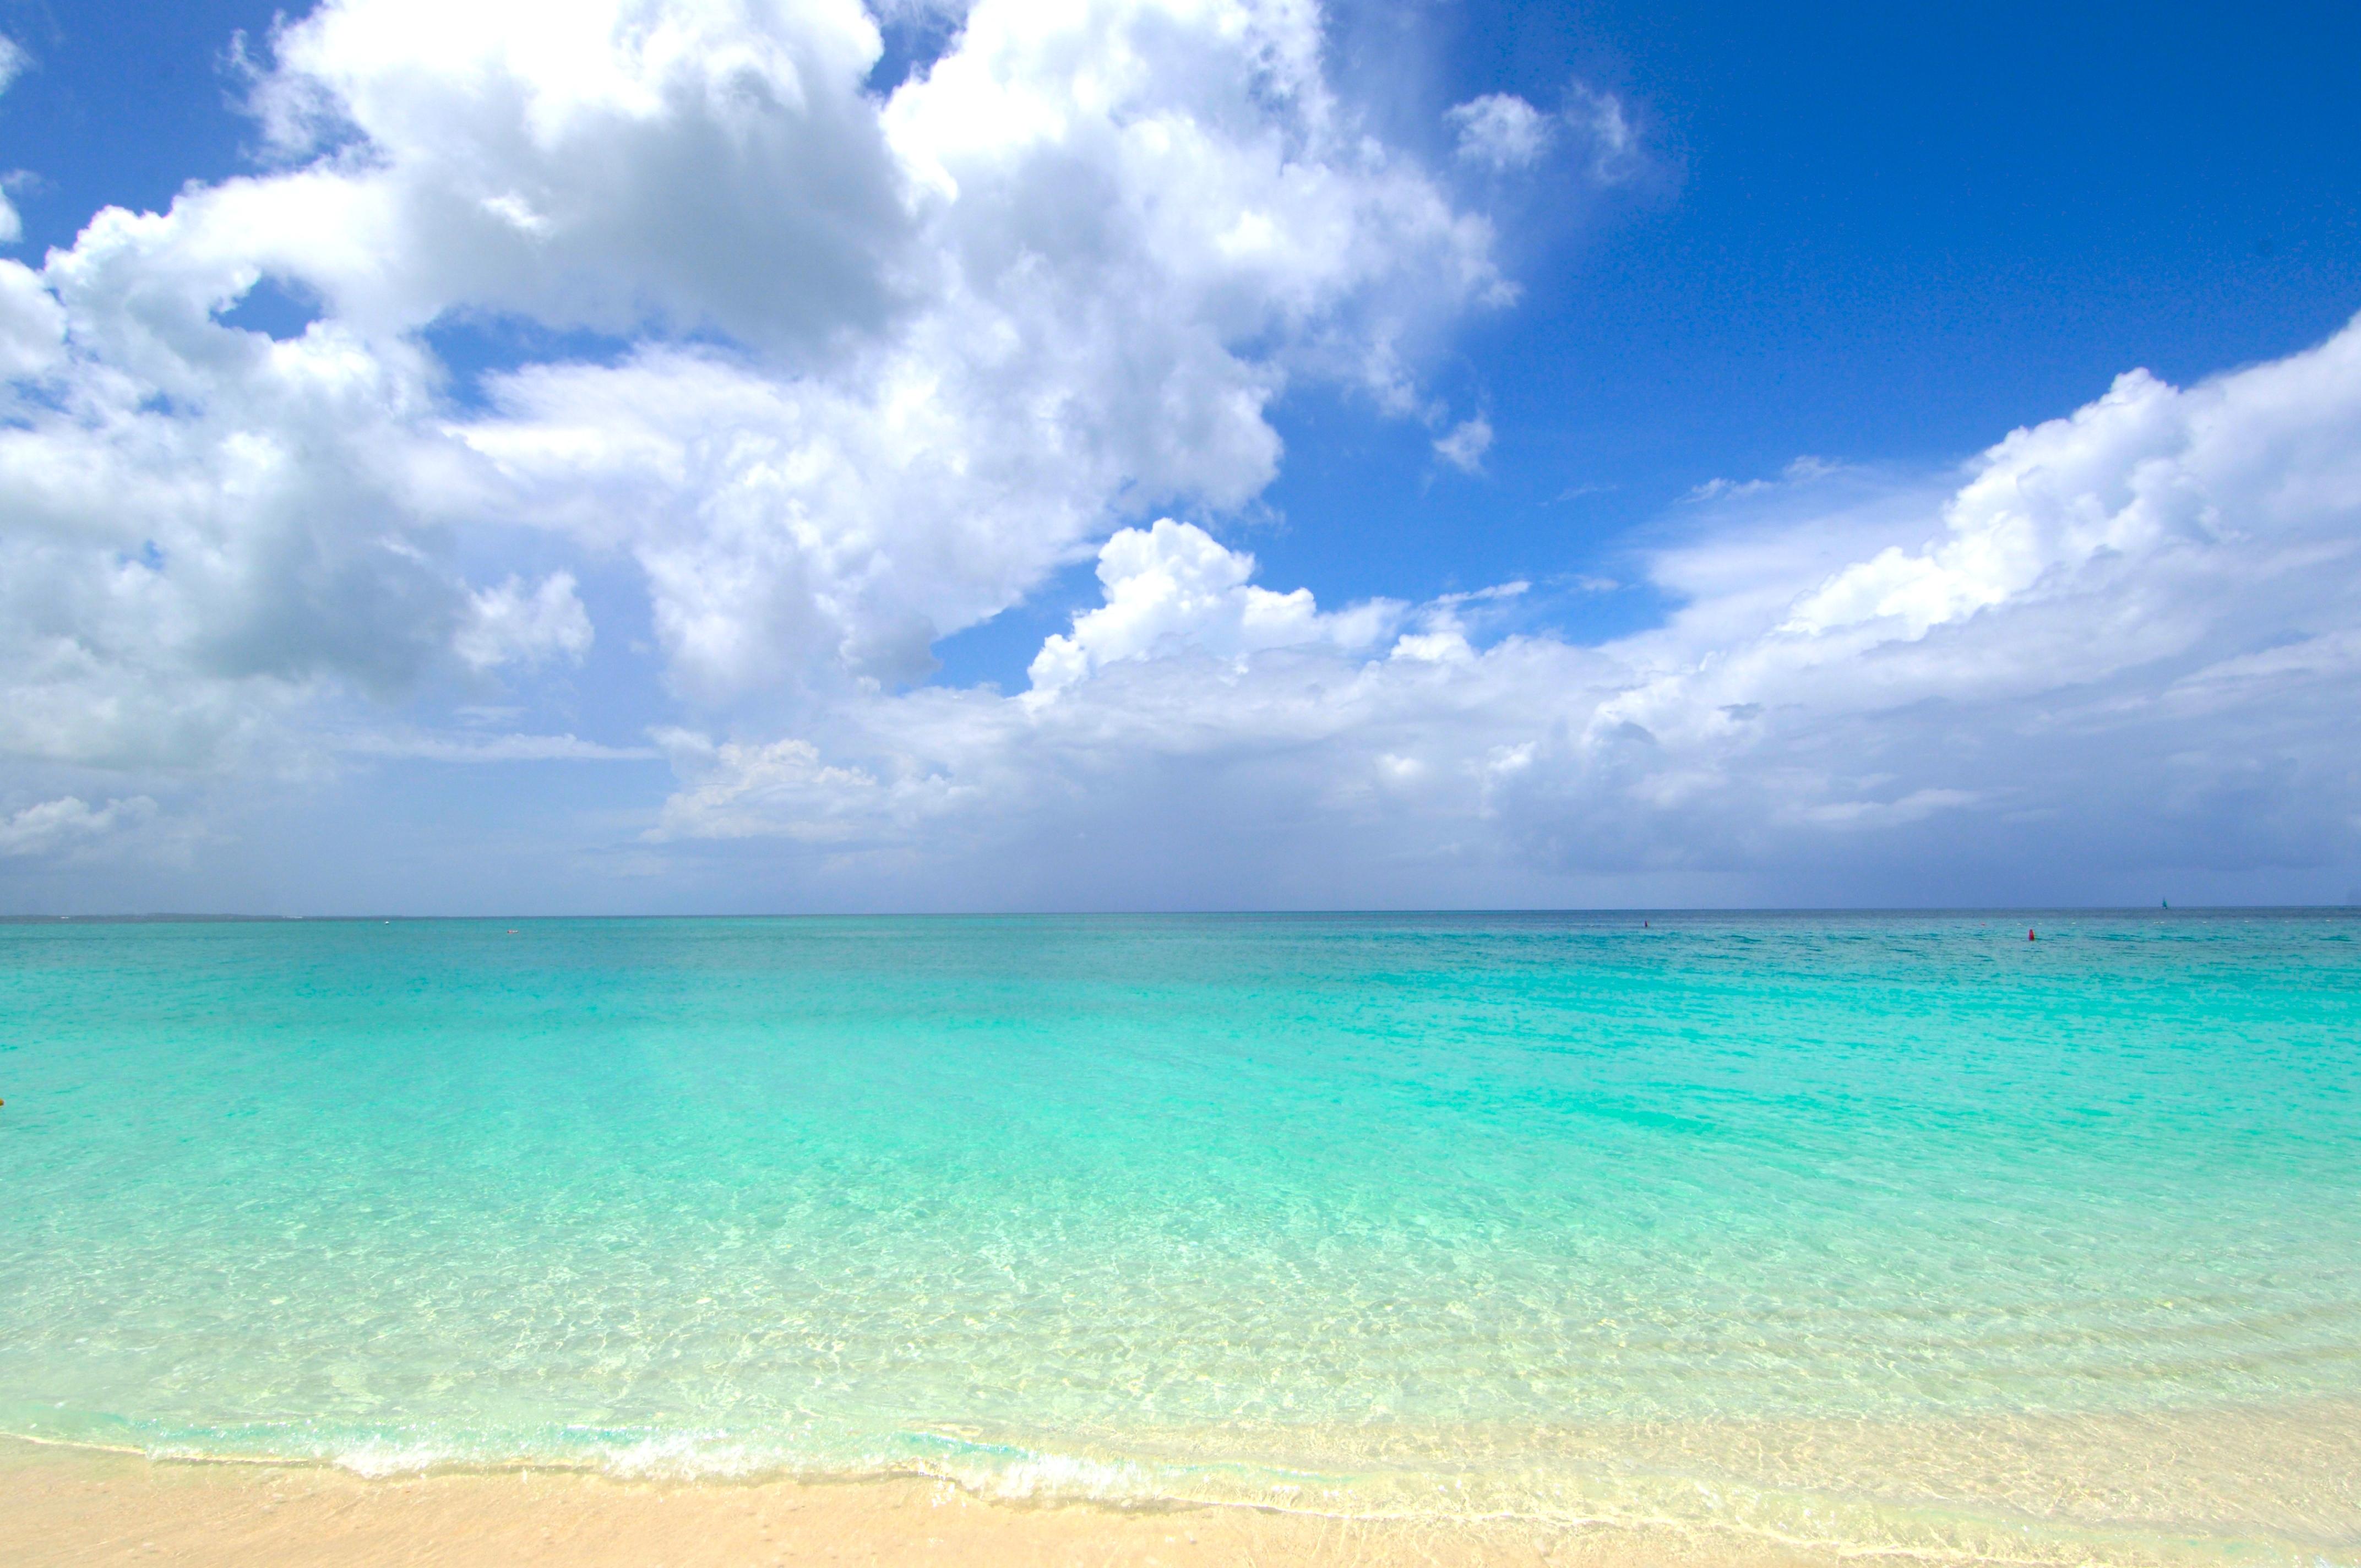 Beach Grace Bay Turks Caicos 4k Ultra Hd Wallpaper Earth